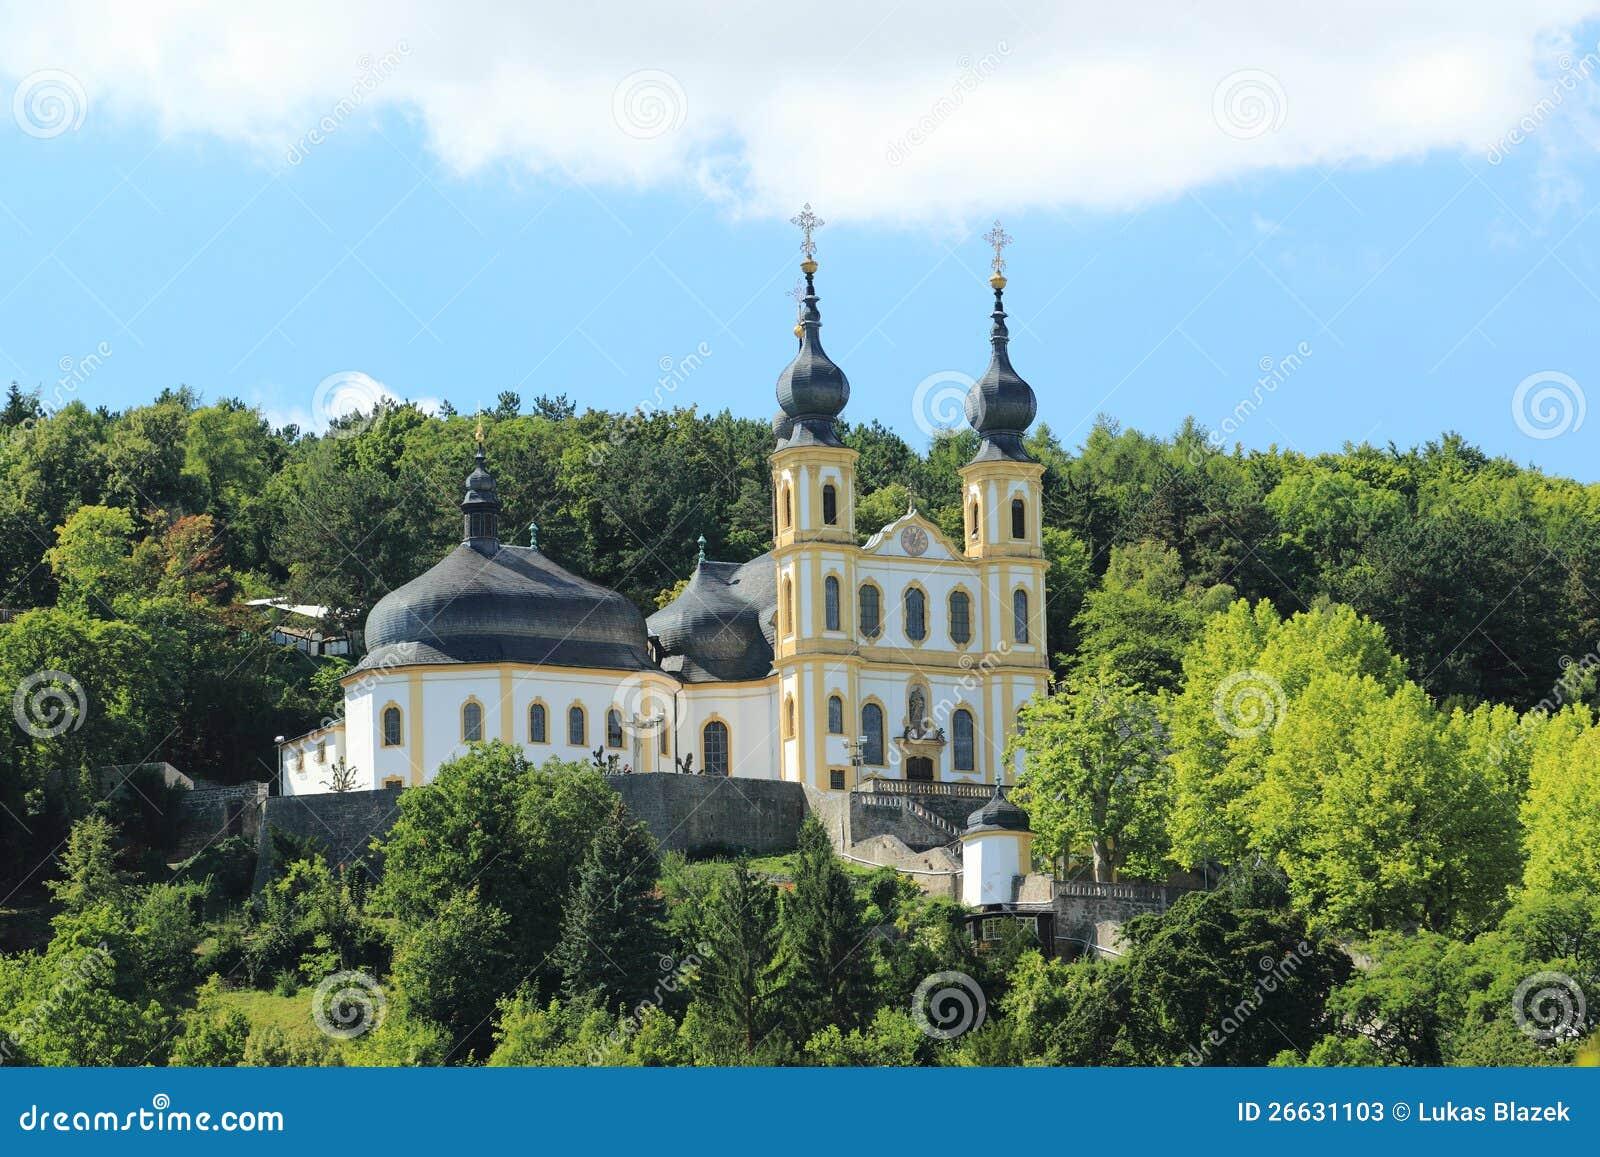 Monastery of capuchins in Wurzburg